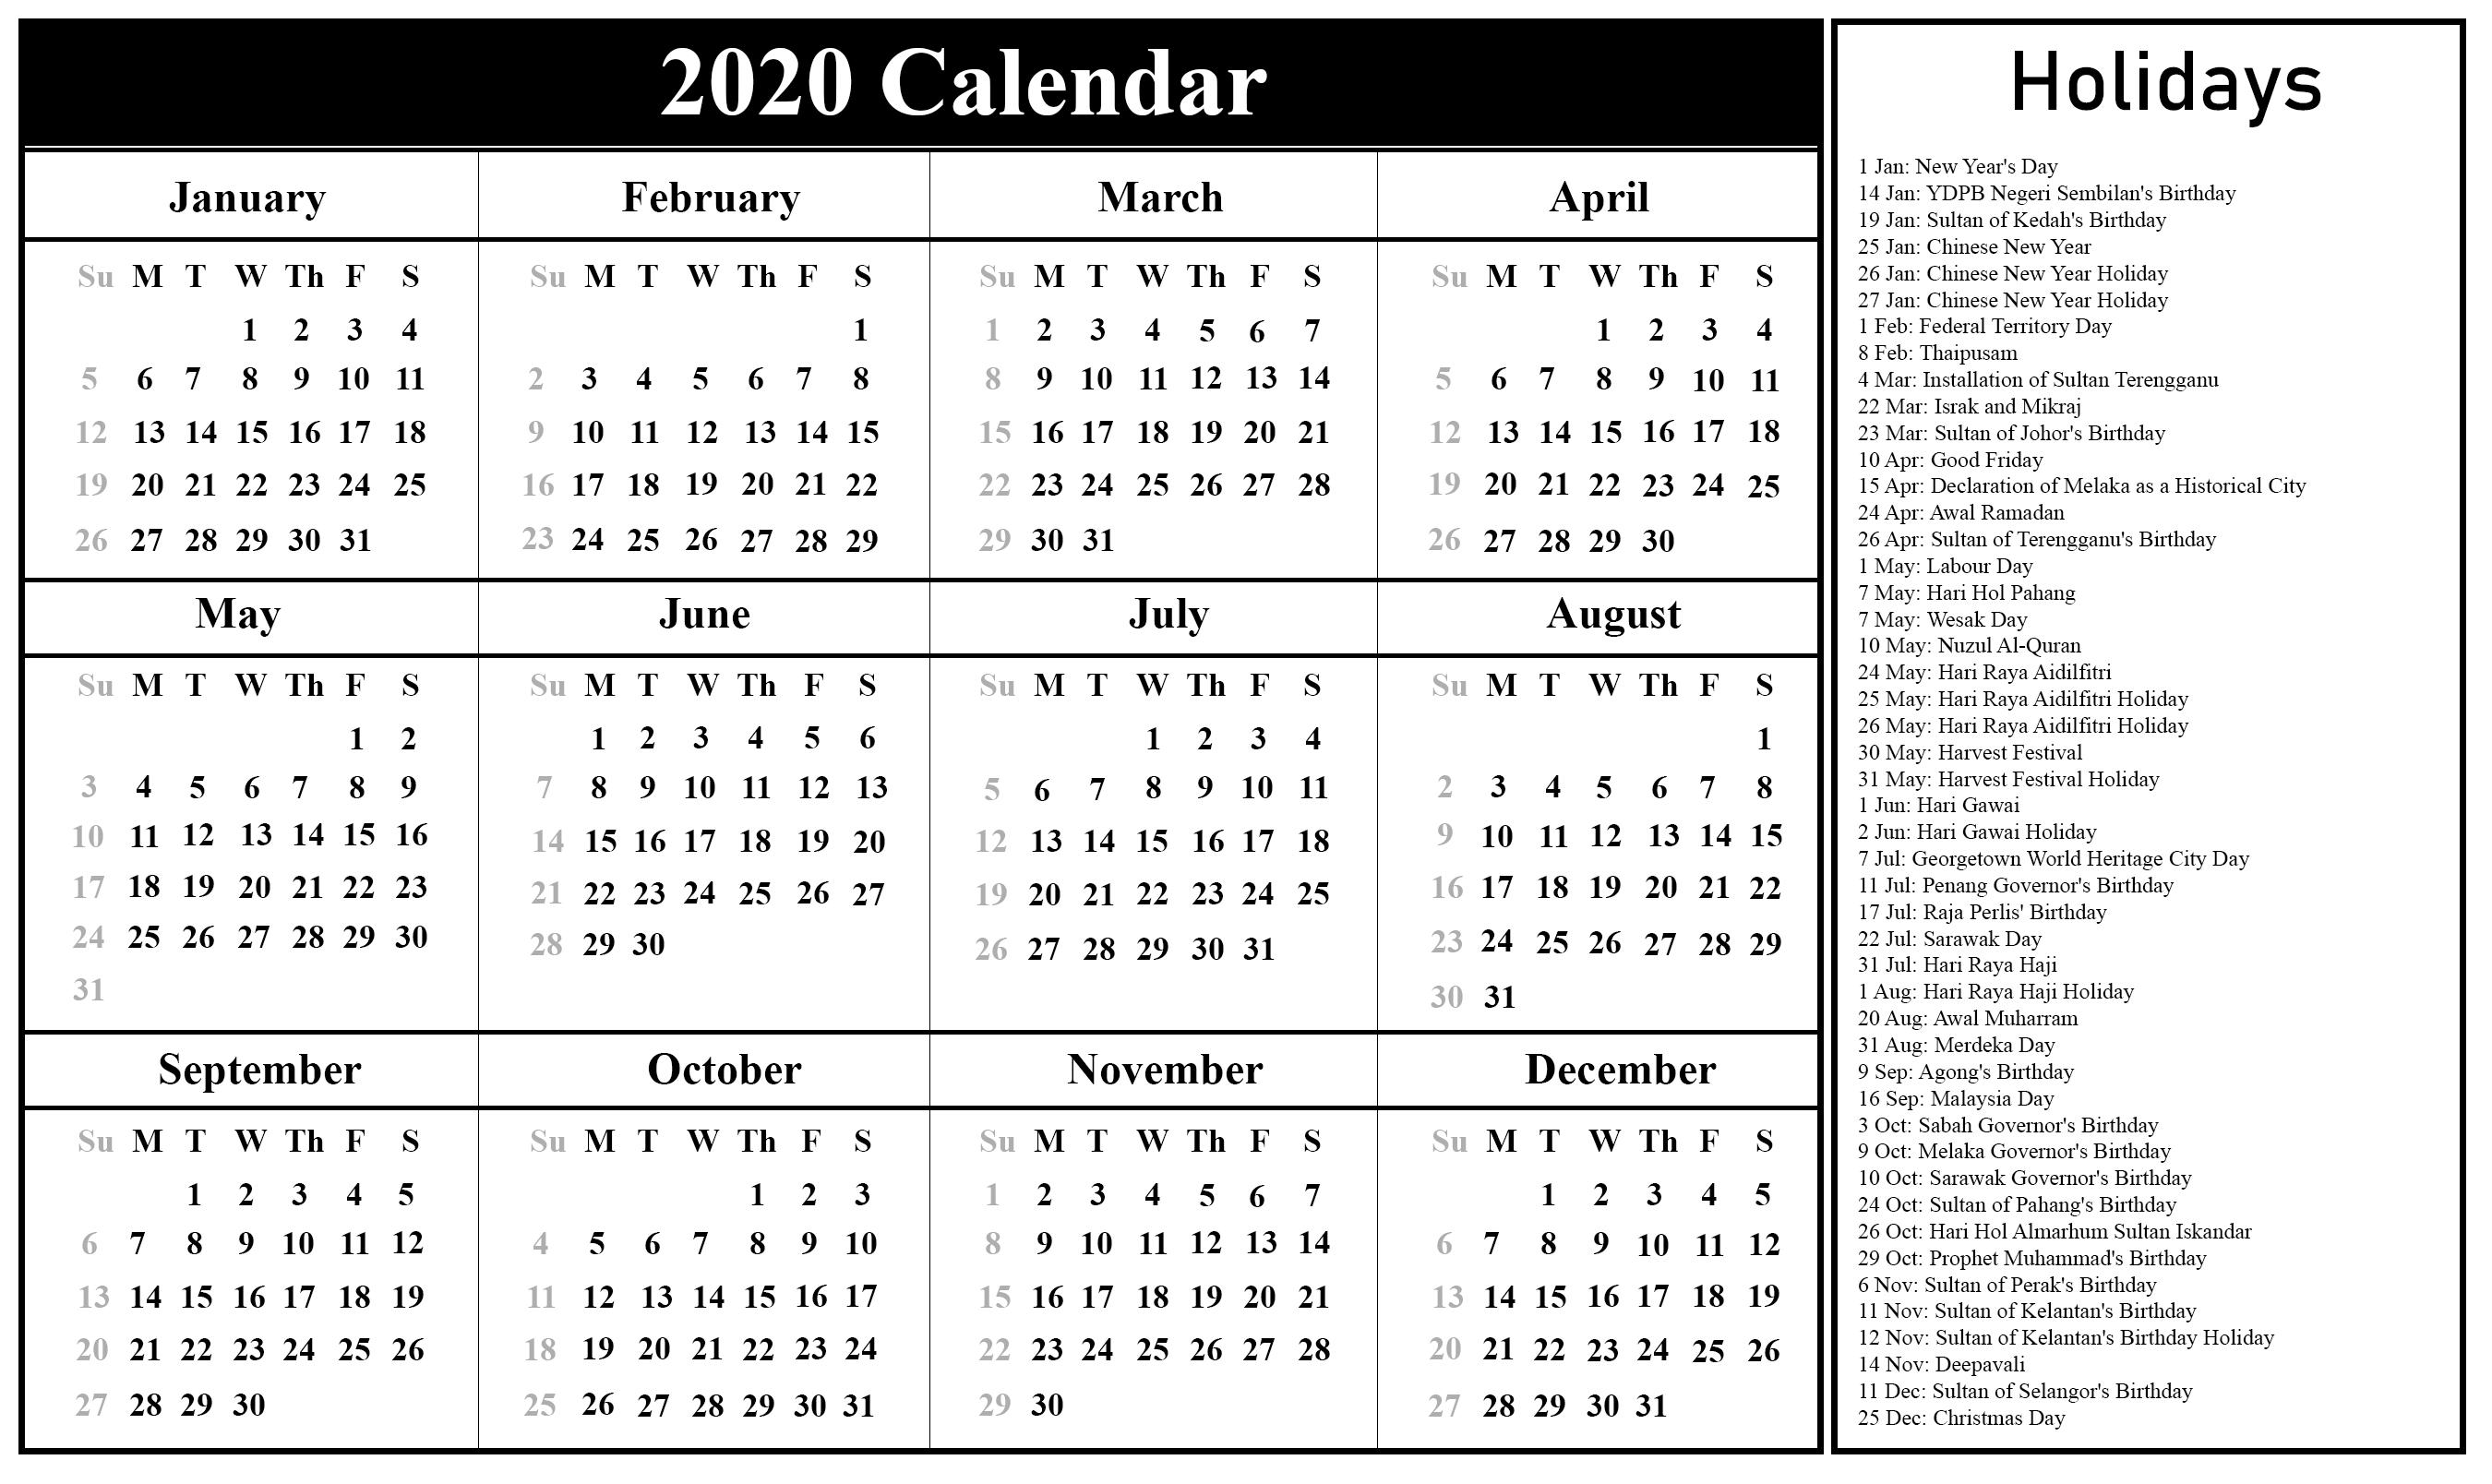 Free Printable Malaysia Calendar 2020 In Pdf, Excel & Word-2020 Calendar Of National Holidays Printable